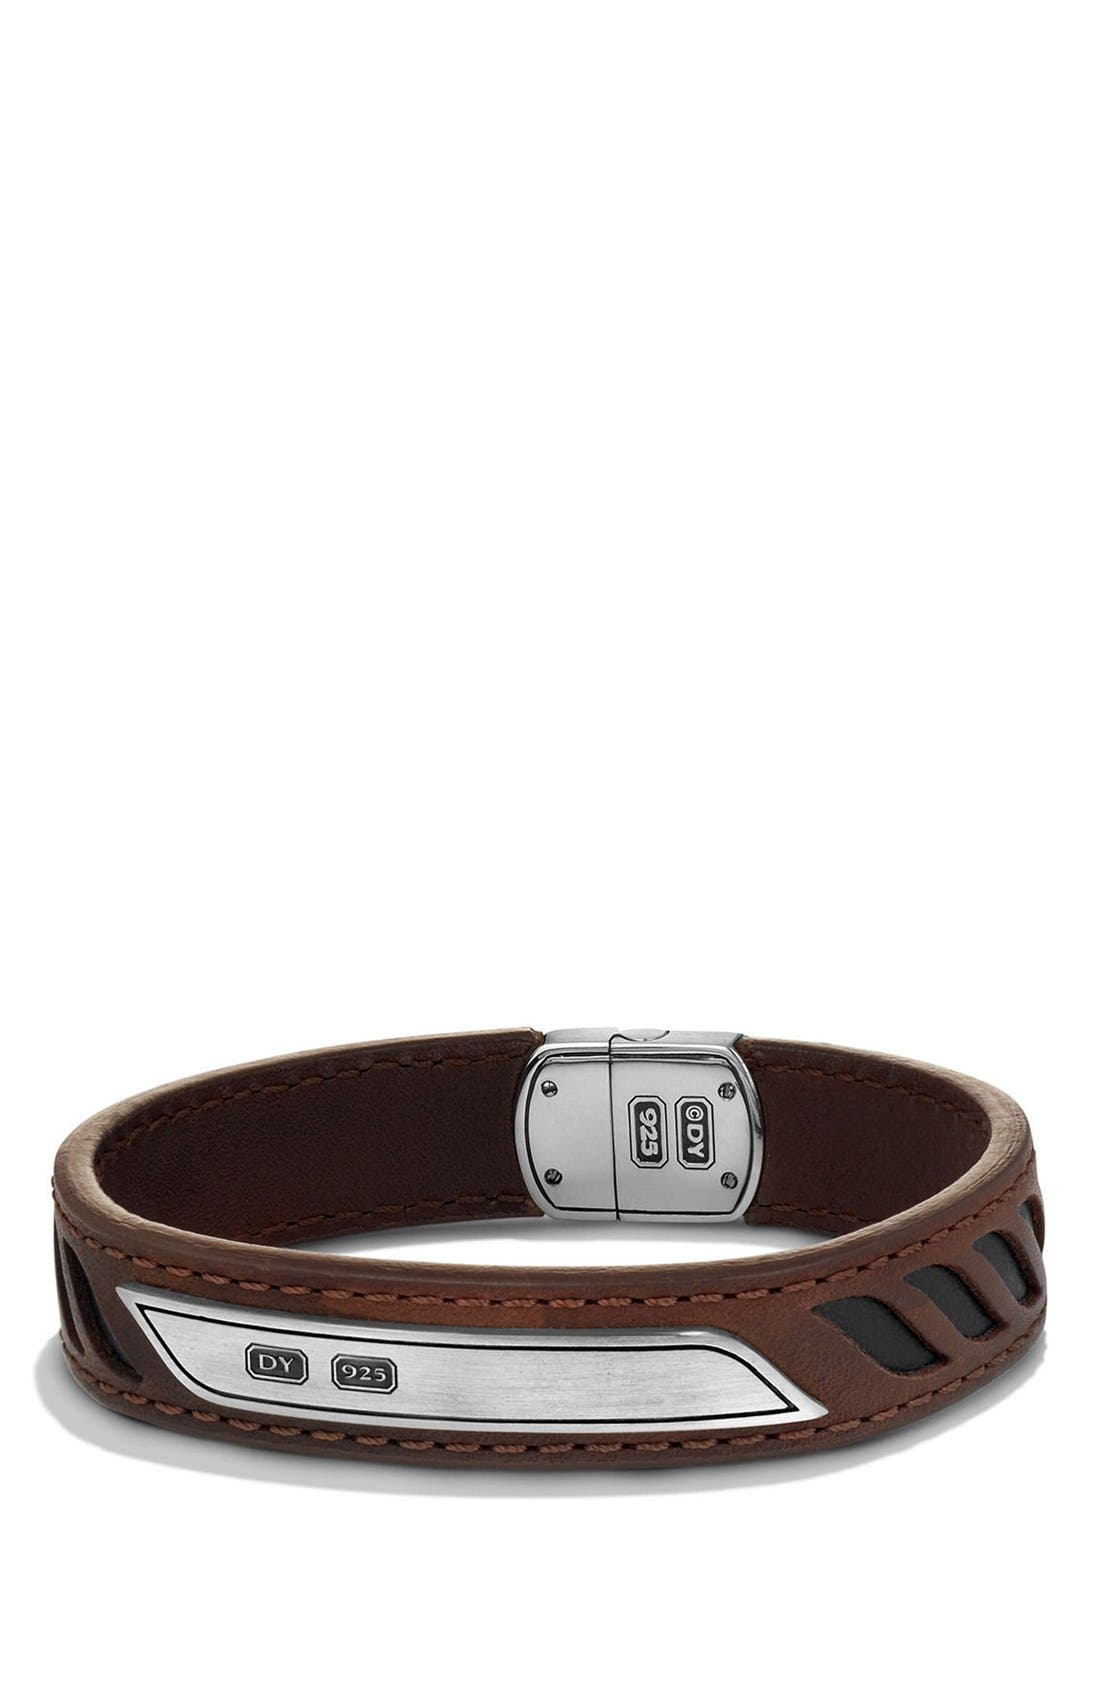 David Yurman 'Graphic Cable' Leather ID Bracelet